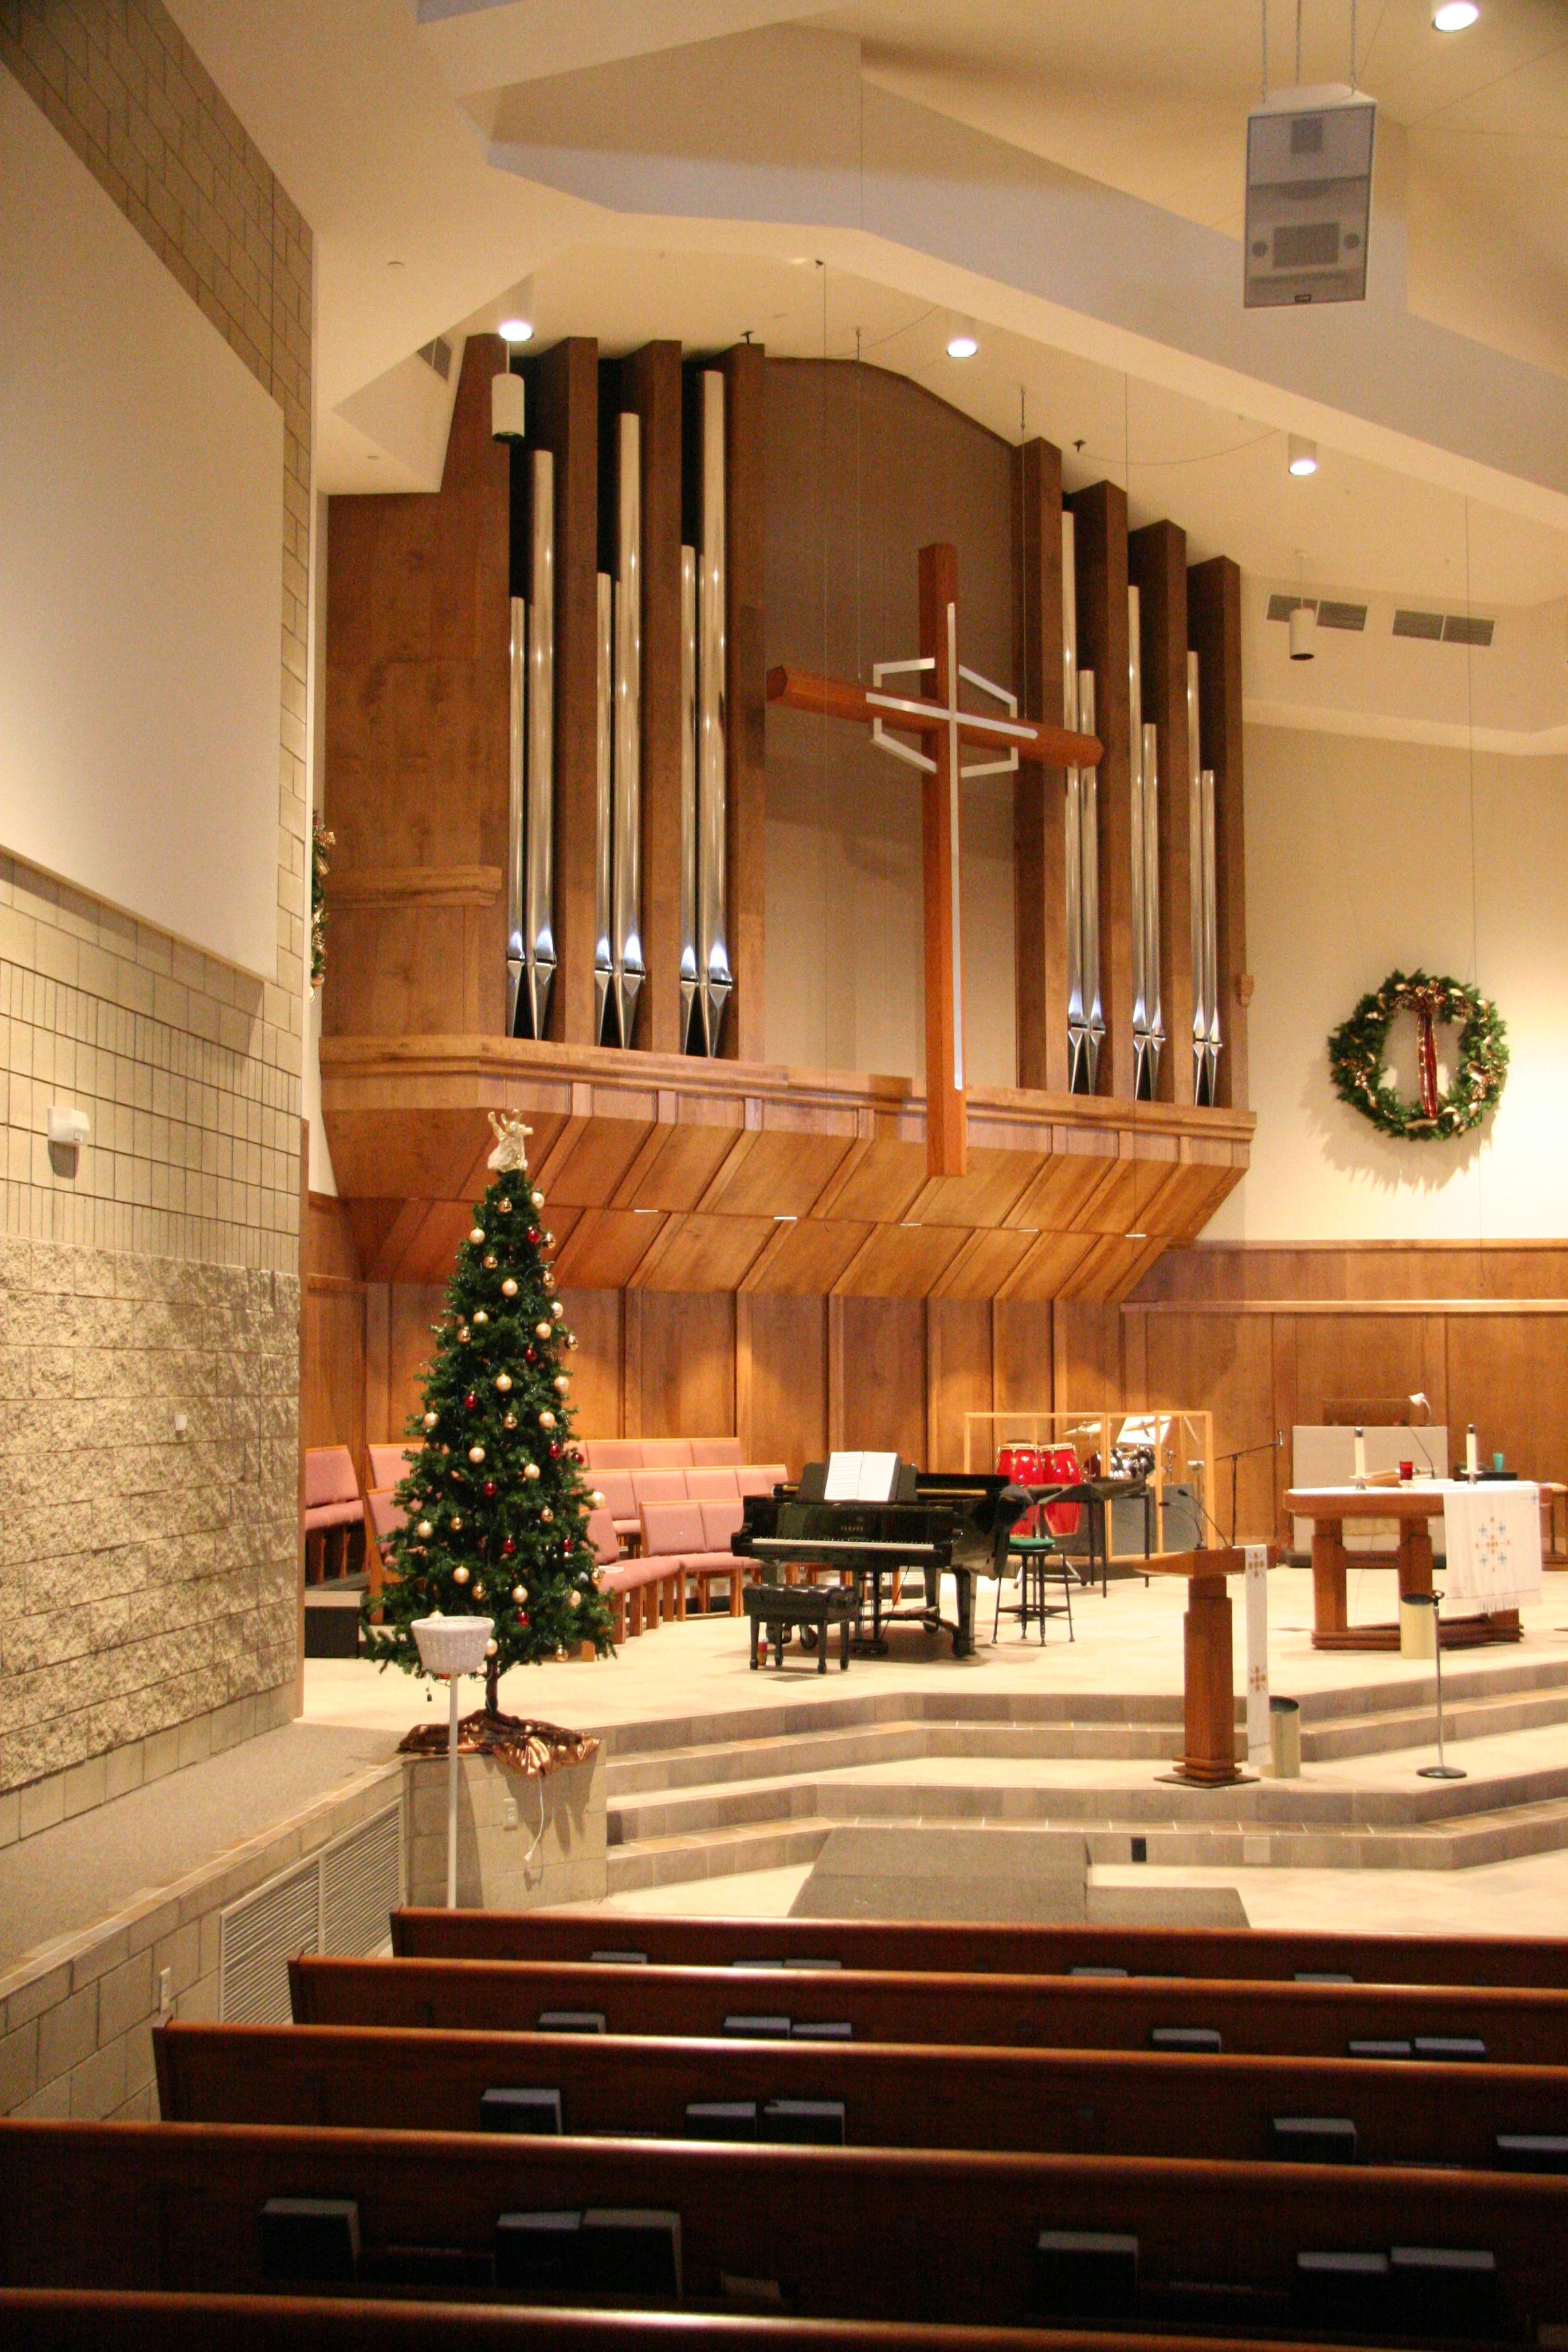 Community Of The Cross Lutheran Church - Bloomington, Minn.